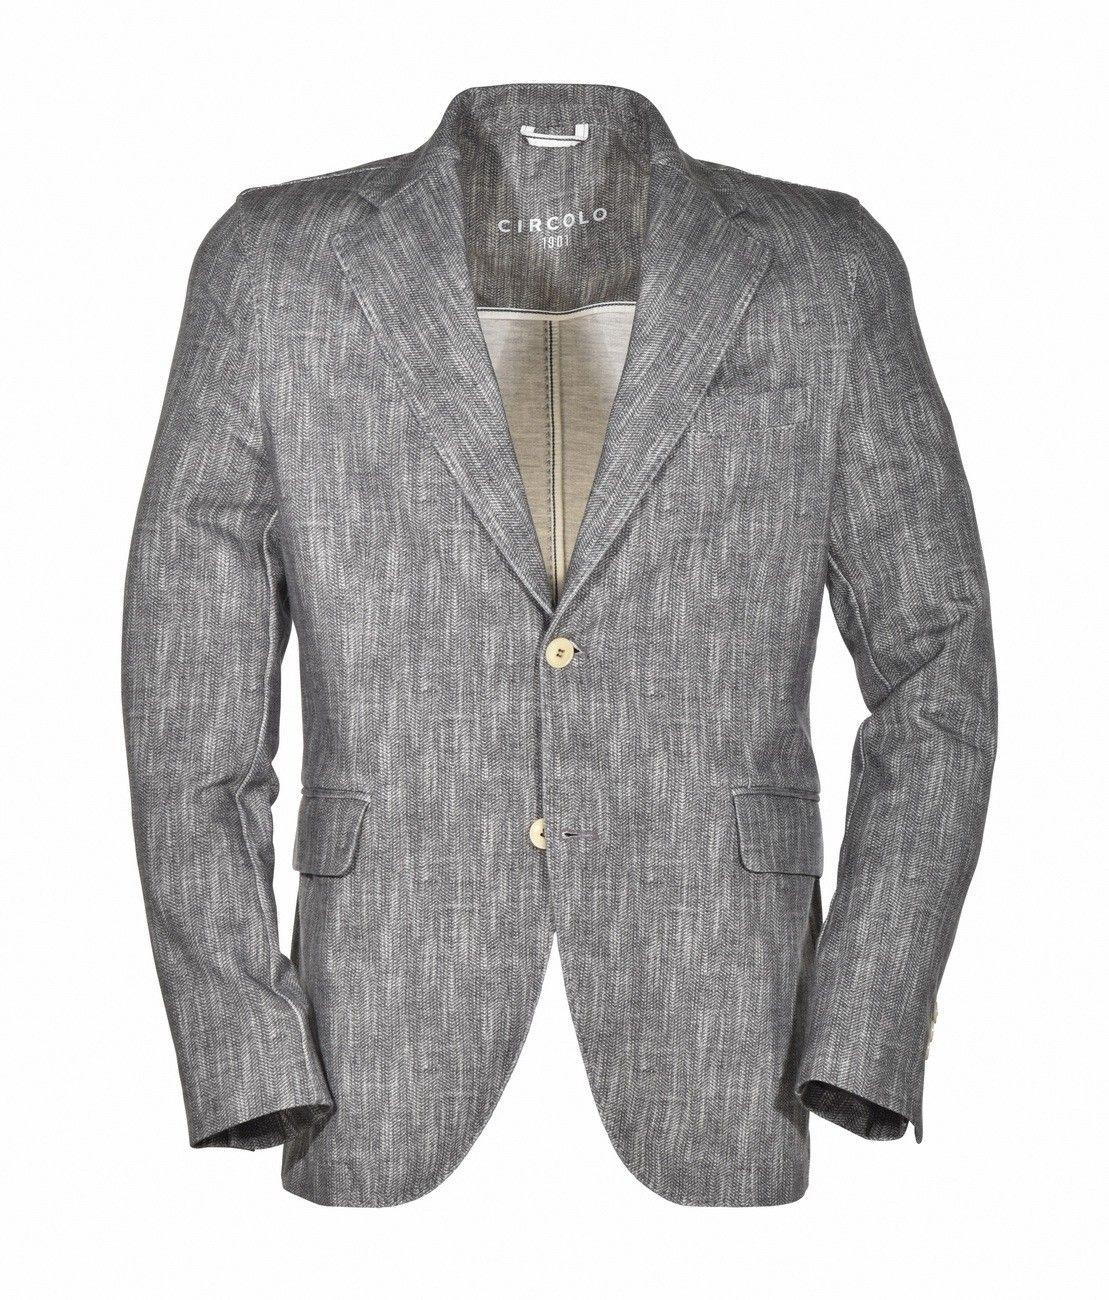 CIRCOLO 1901 - Herren Sakko - Men's Jacket - Fischgrat